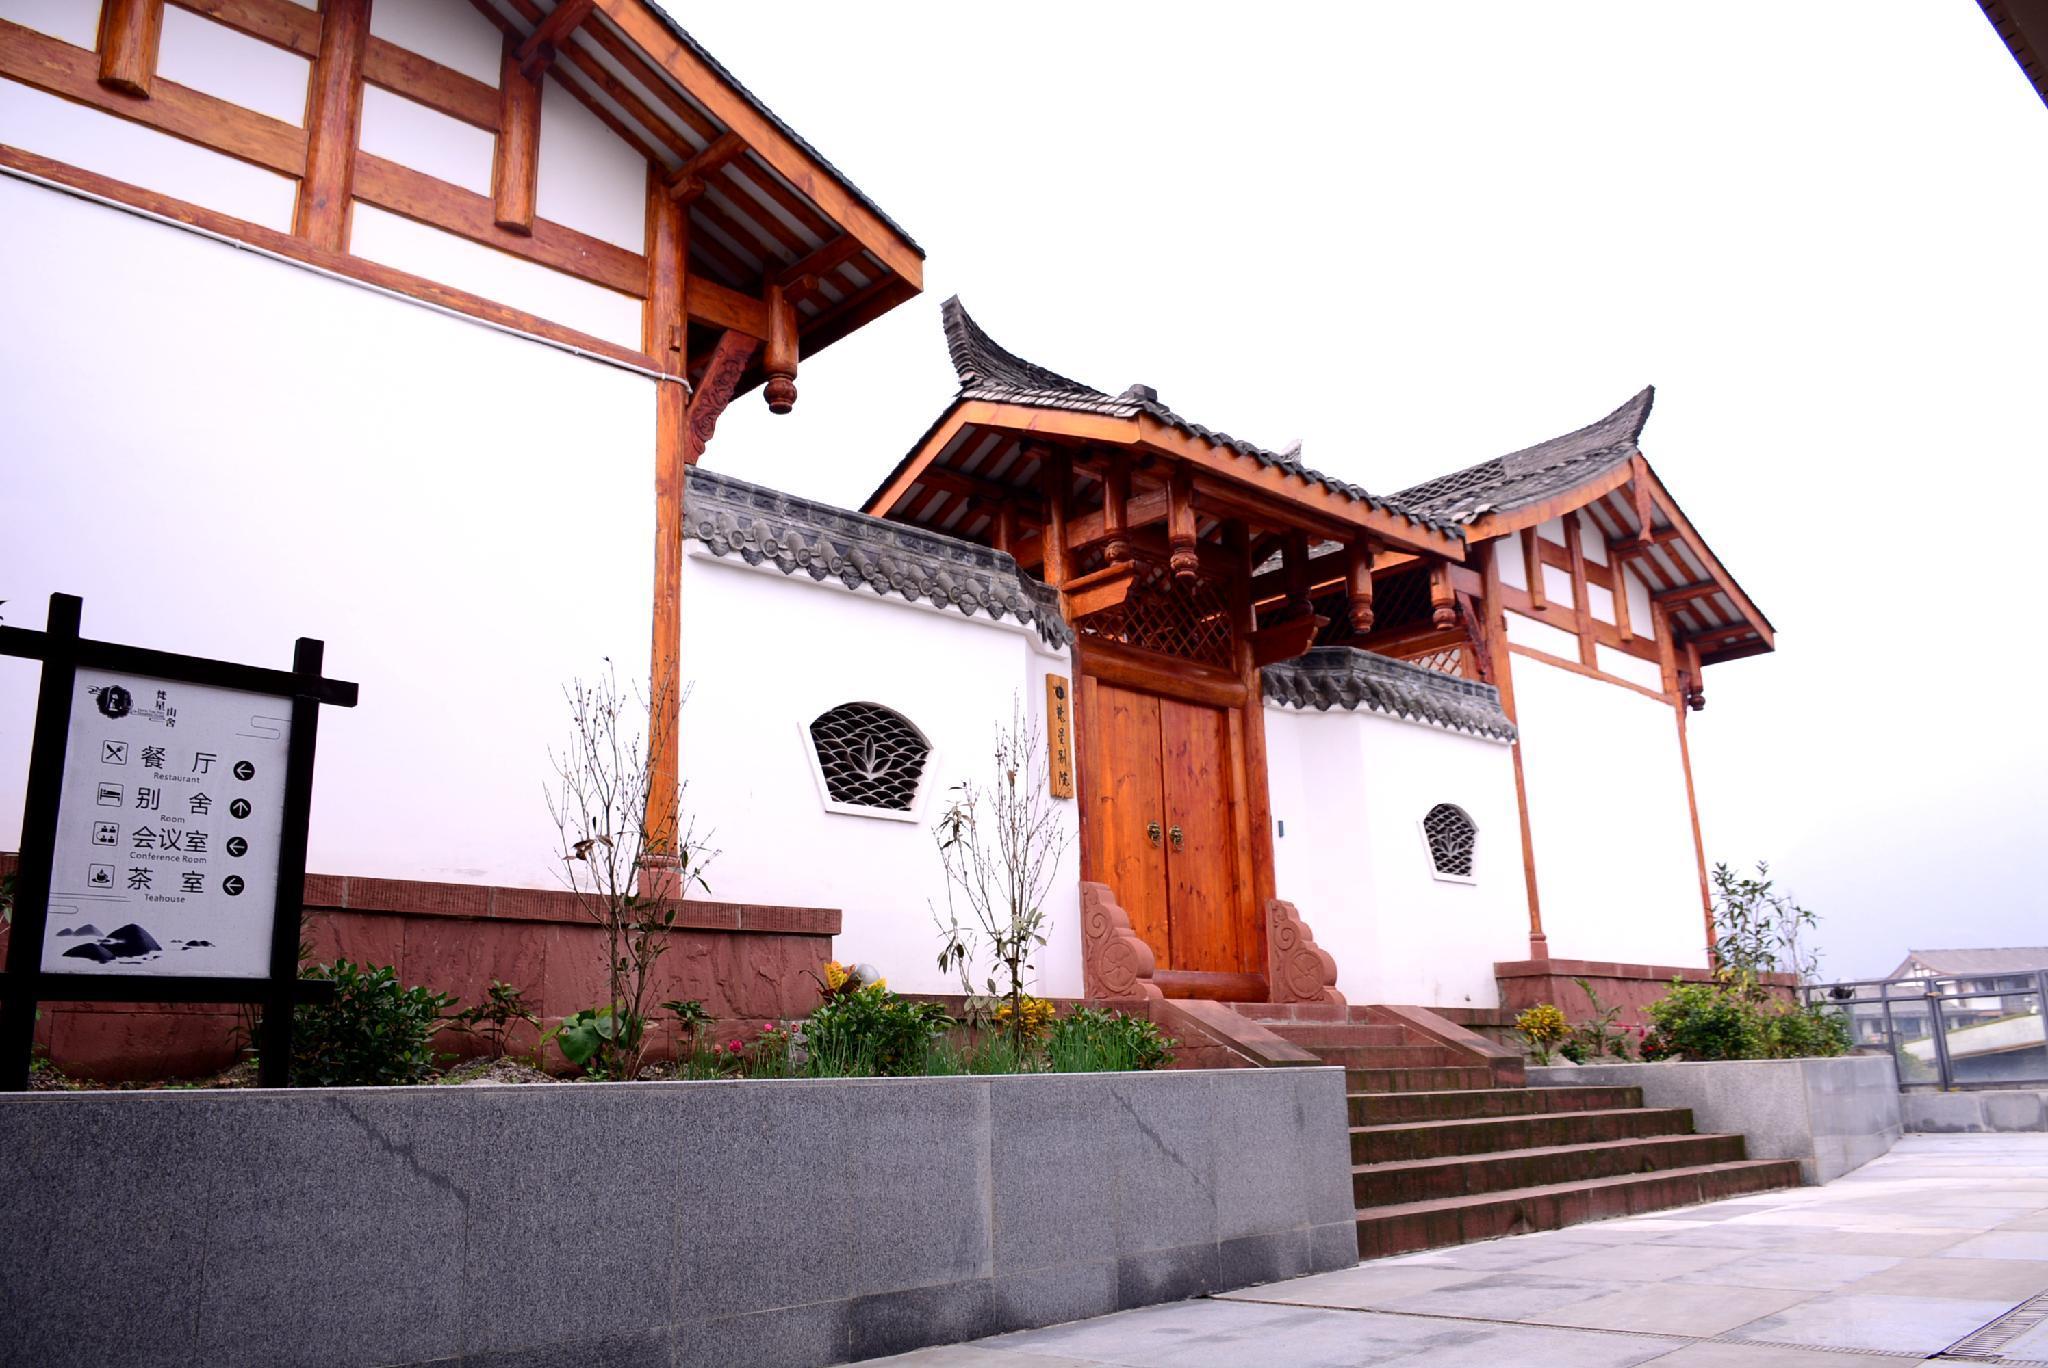 book emeis van stars mountain house in mount emei china 2018 promos rh agoda com